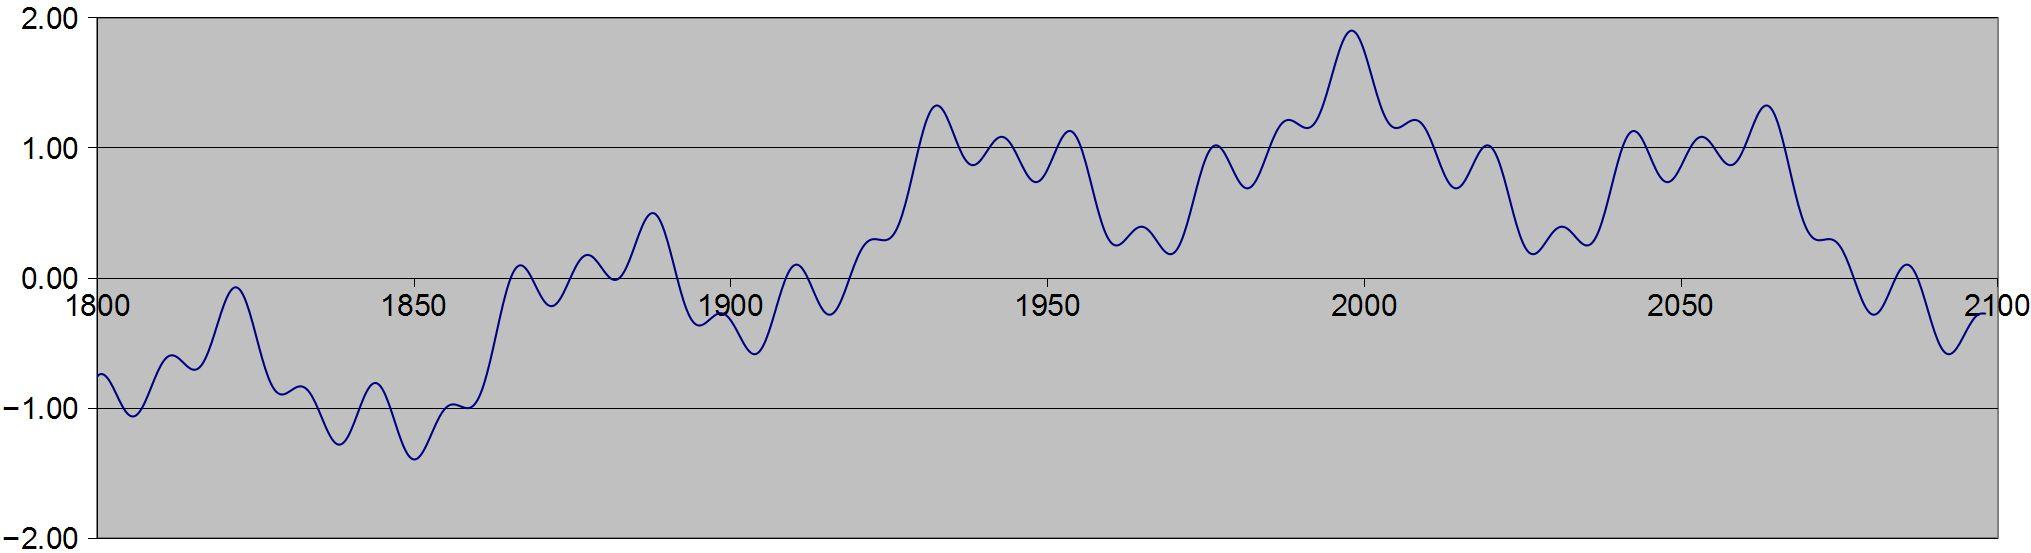 Global Temperature Rise Simulation